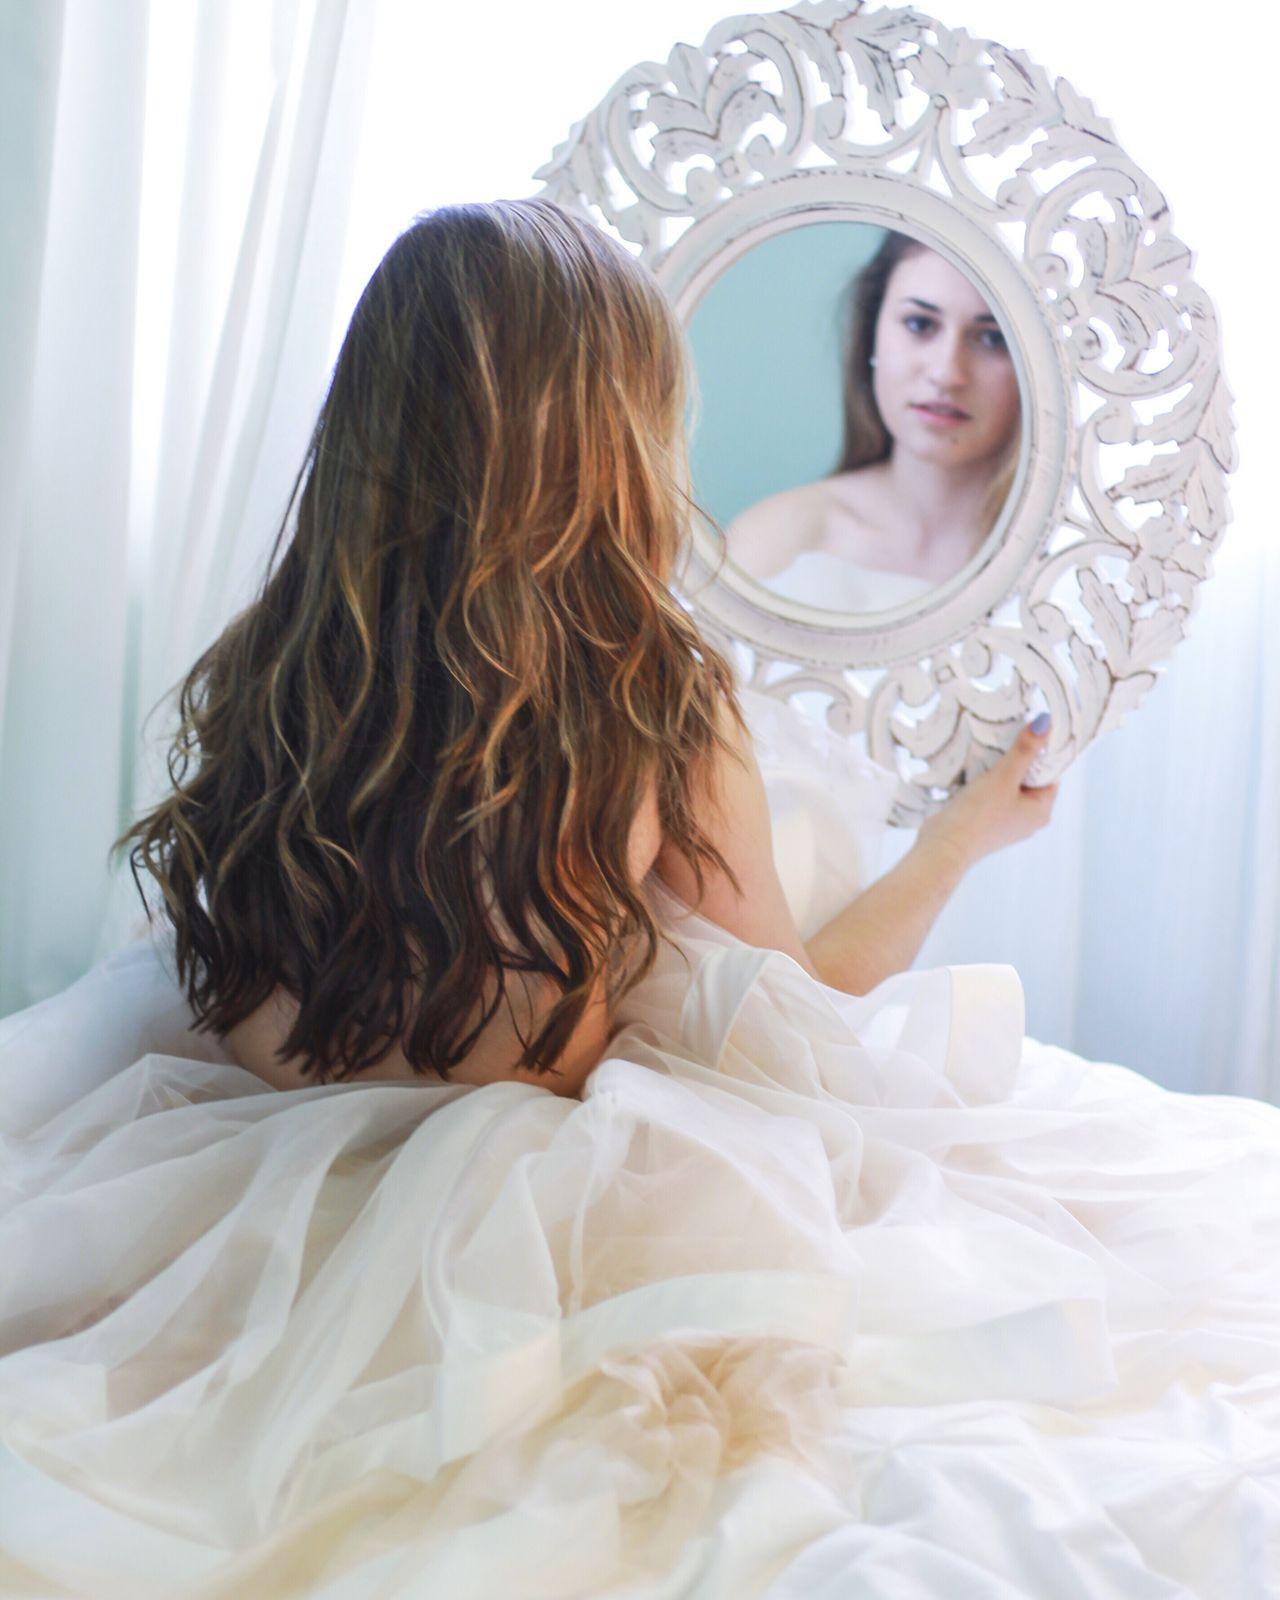 Mirror Bedroom White Hair Bed Sheets Brunette Girl Woman Portrait Portrait Comfy